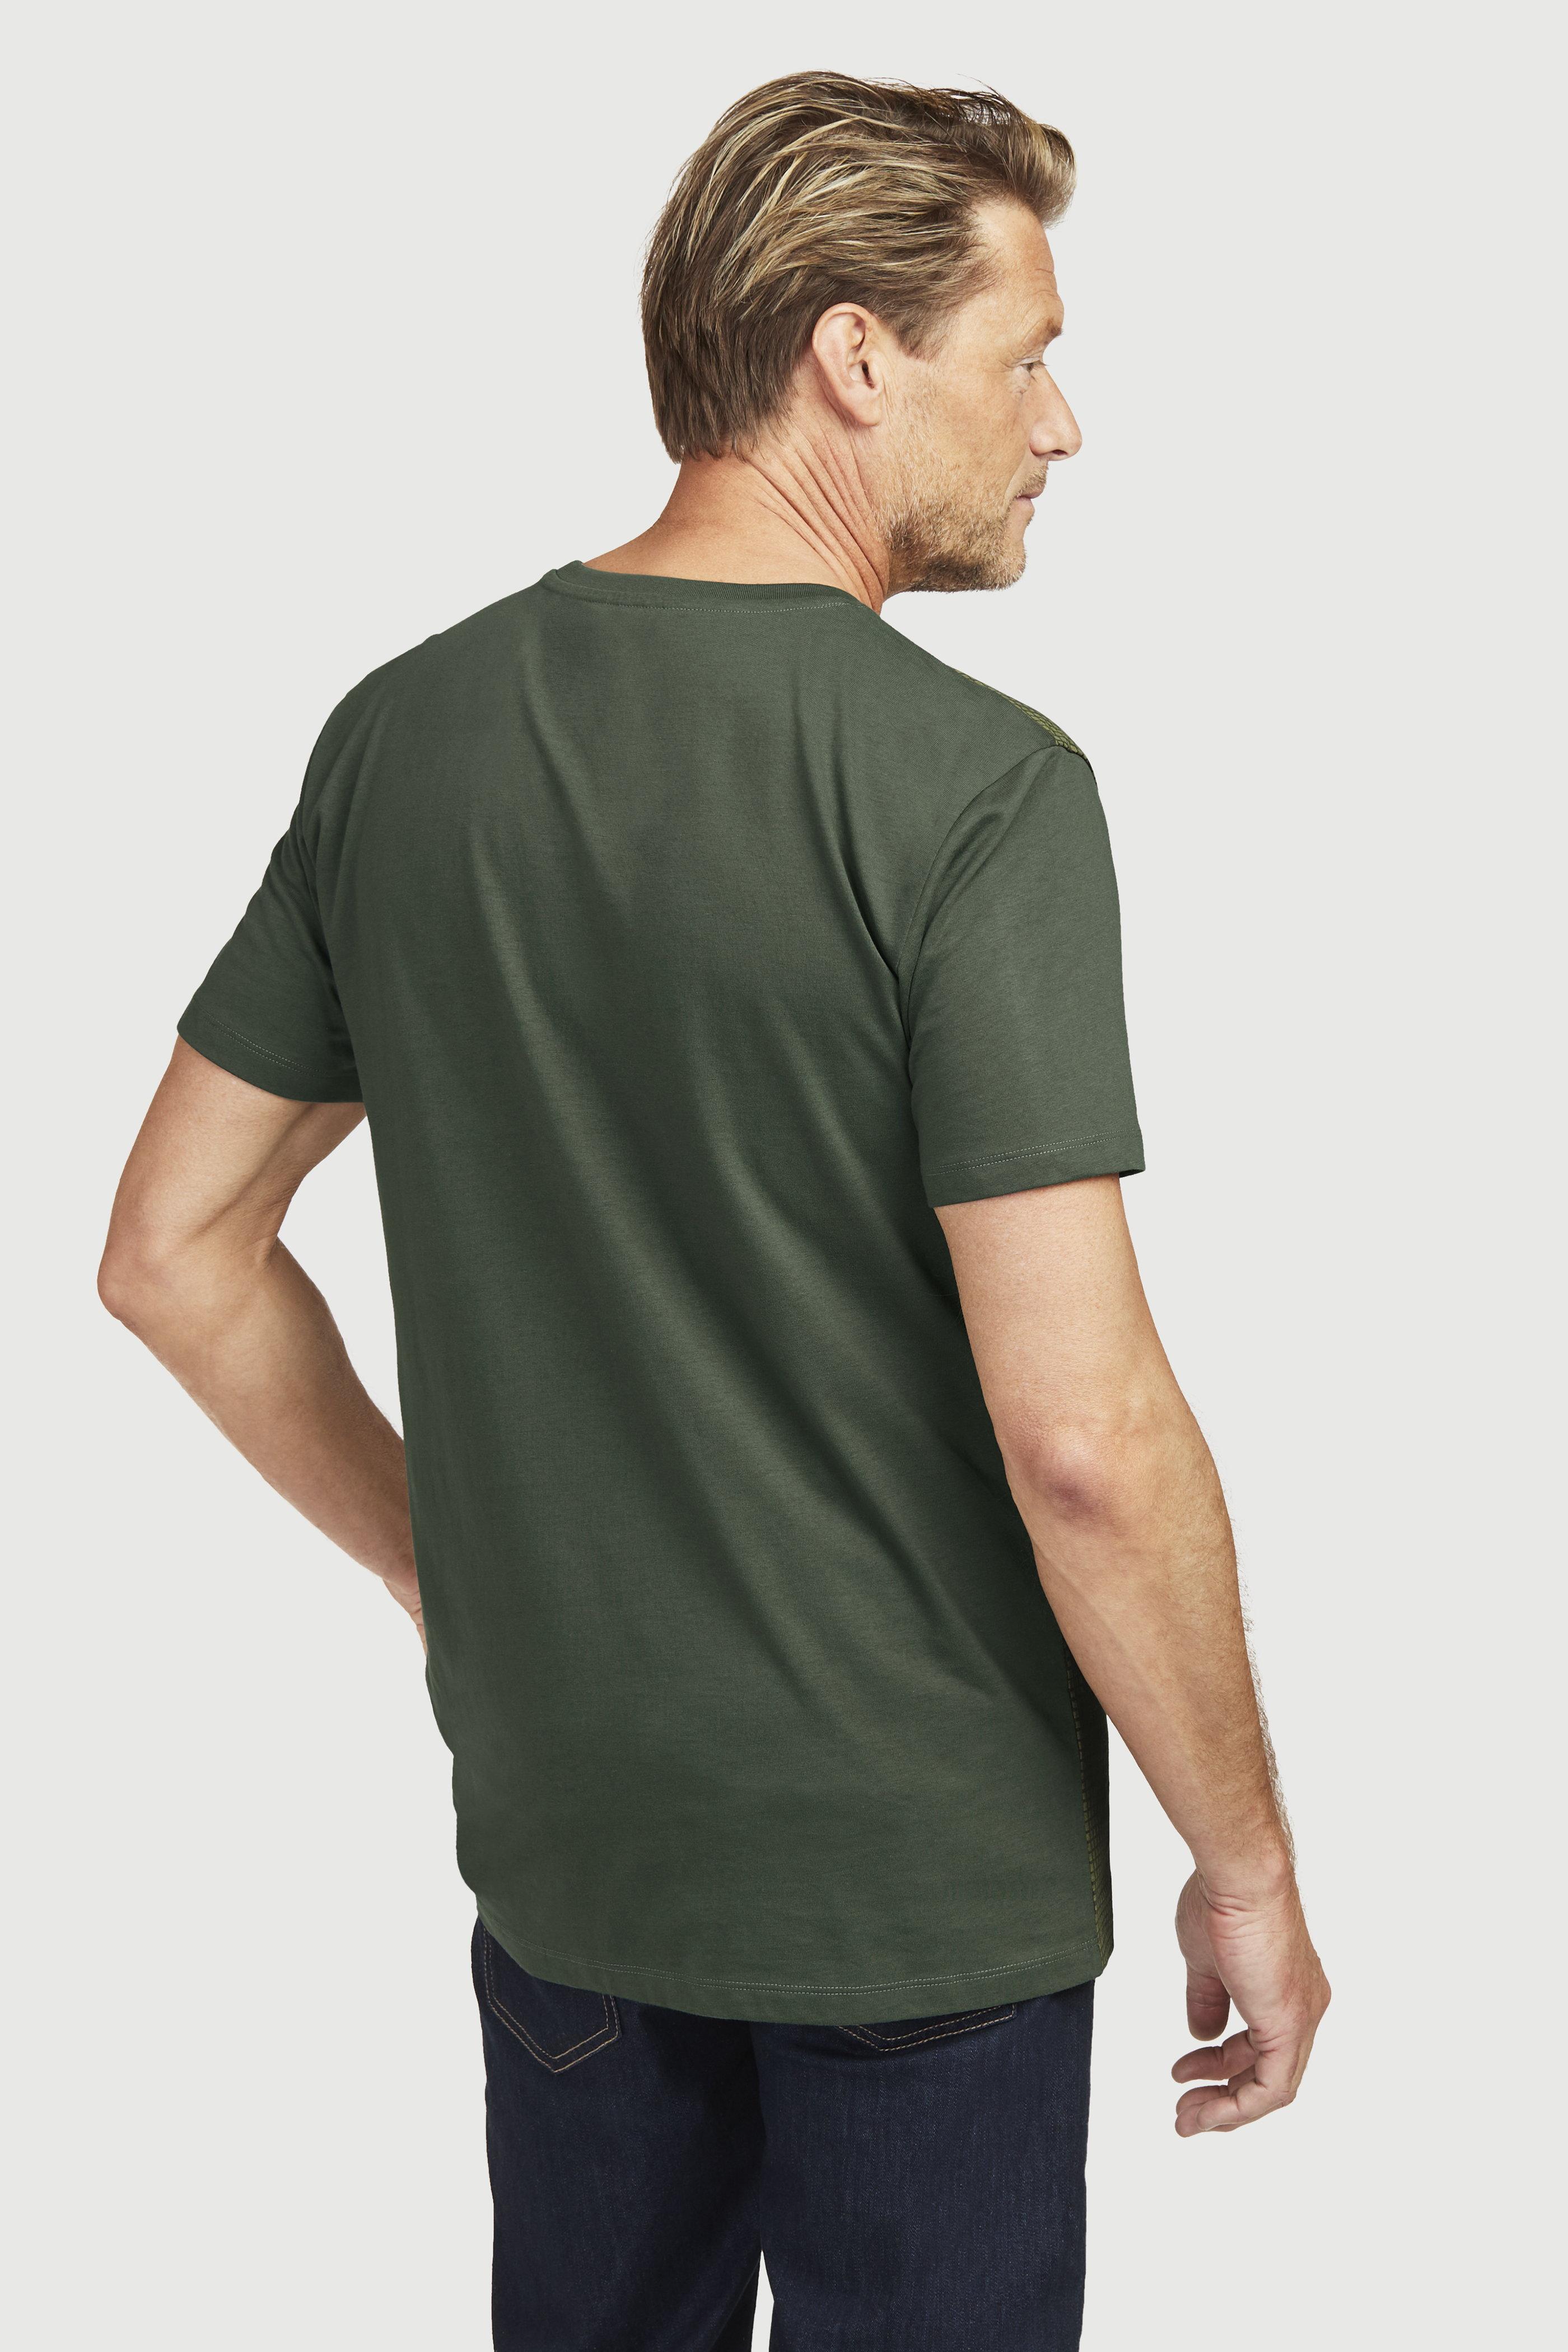 Trikotaažist mugav T-särk